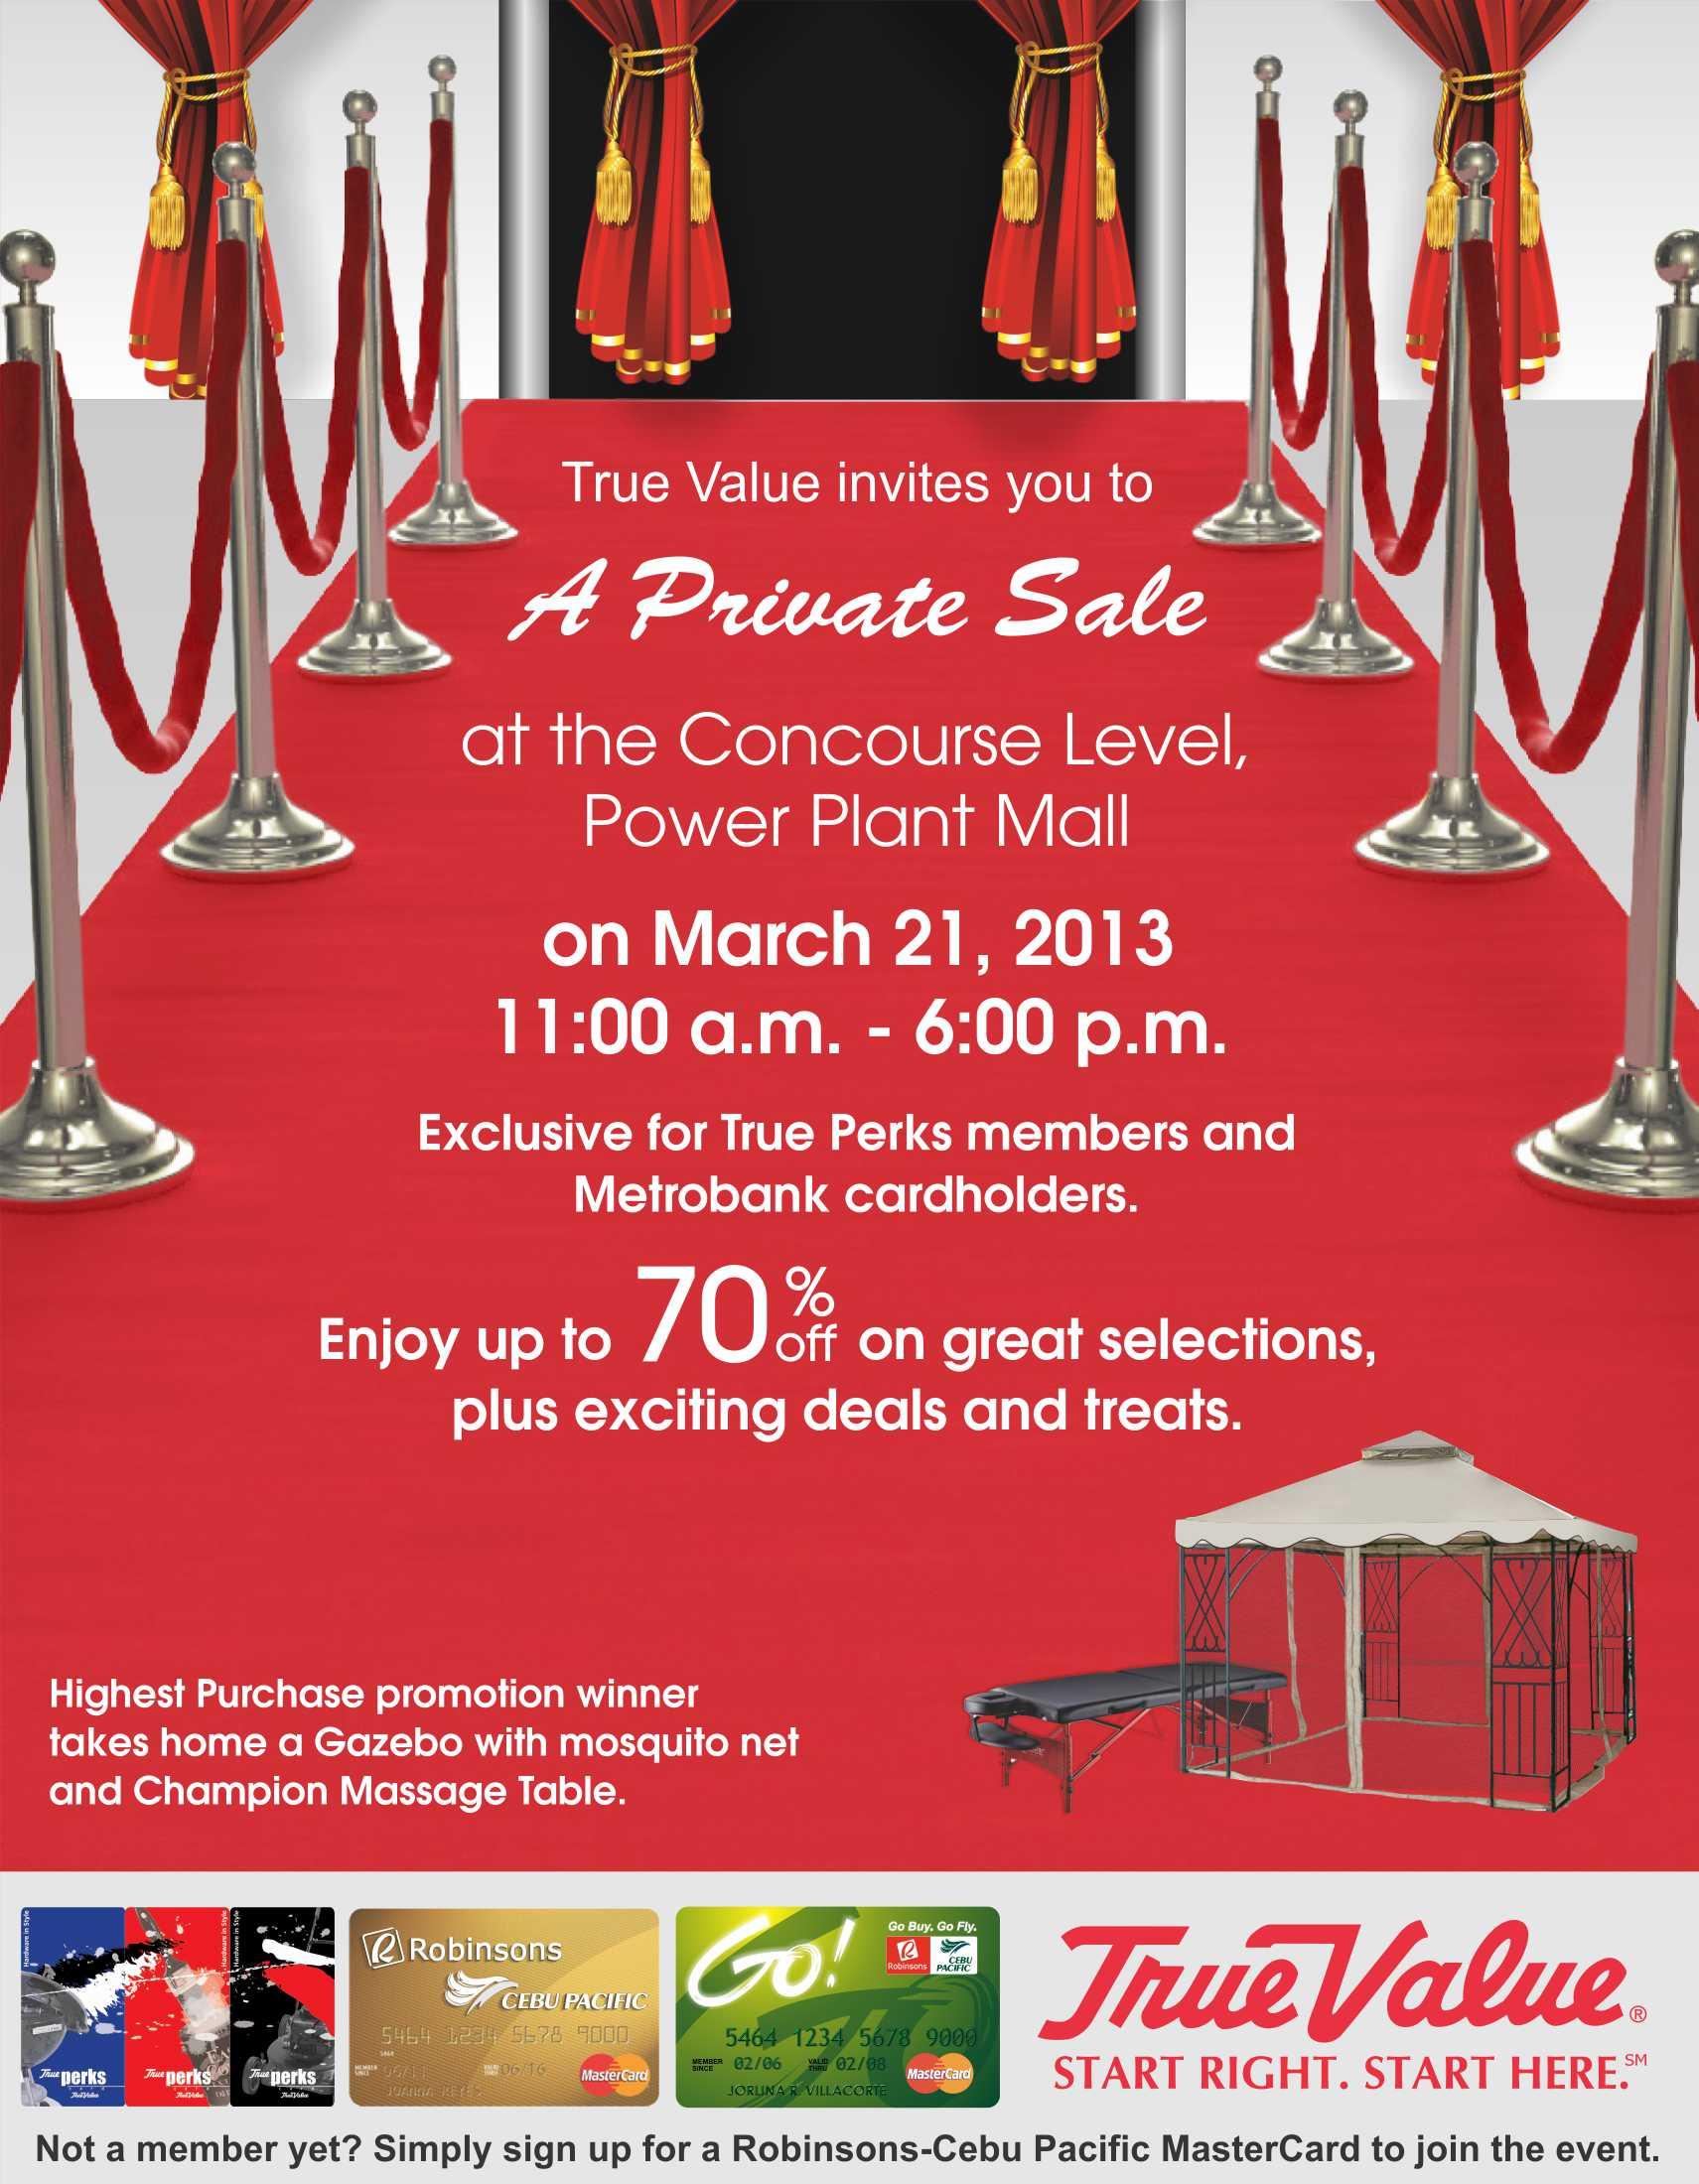 True Value Private Sale @ Power Plant Mall March 2013